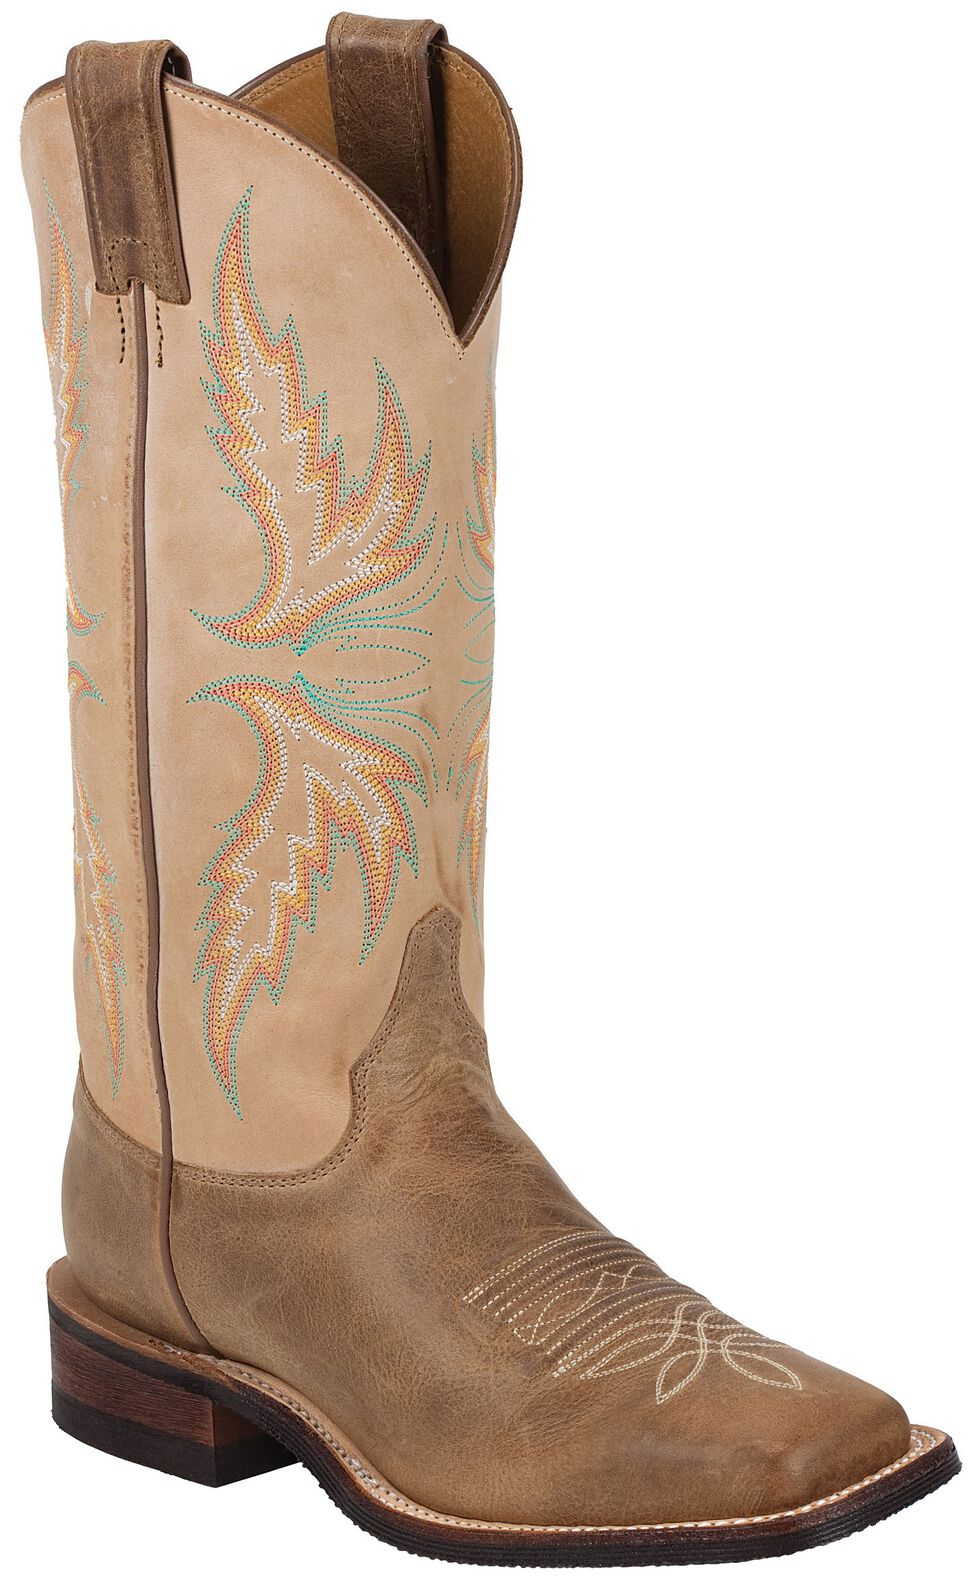 "Justin Bent Rail Women's 13"" Uvalde Mocha Cowgirl Boots - Square Toe, Camel, hi-res"